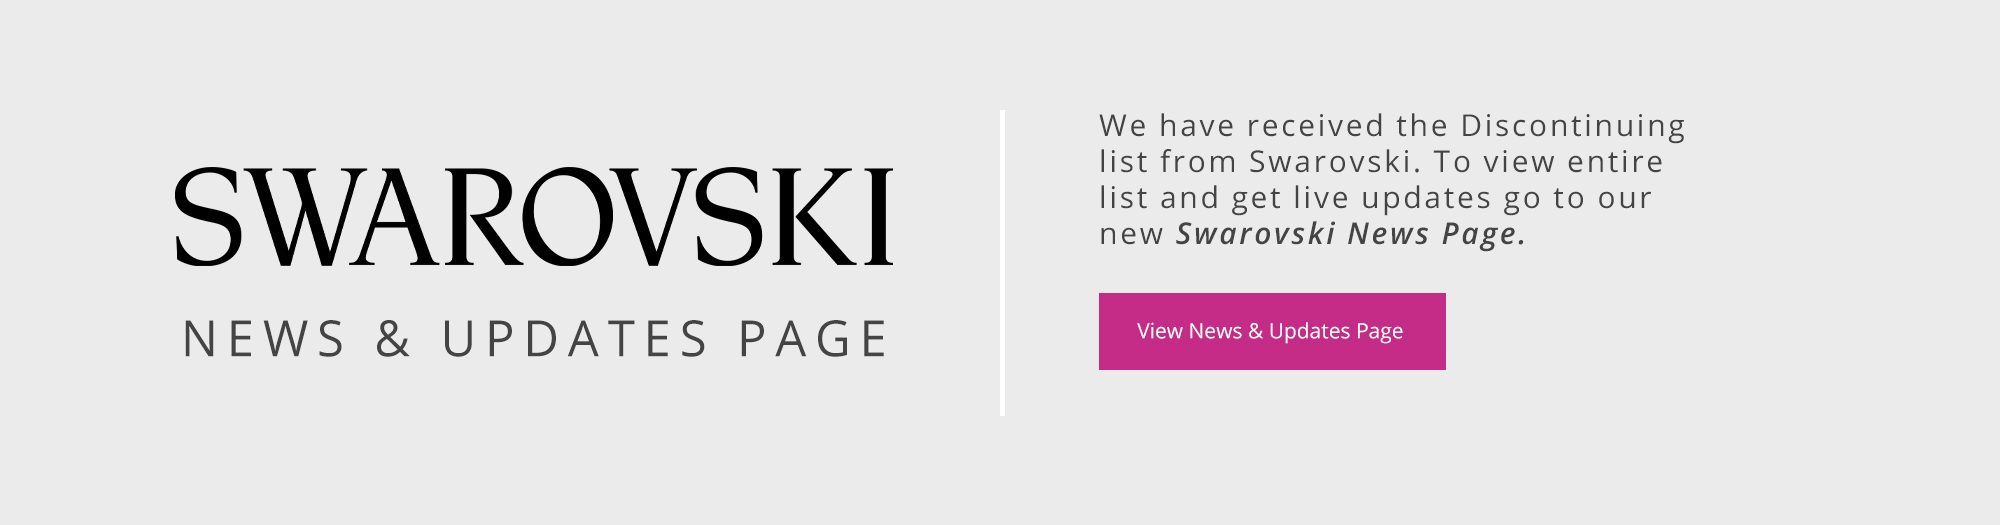 Swarovski News Page